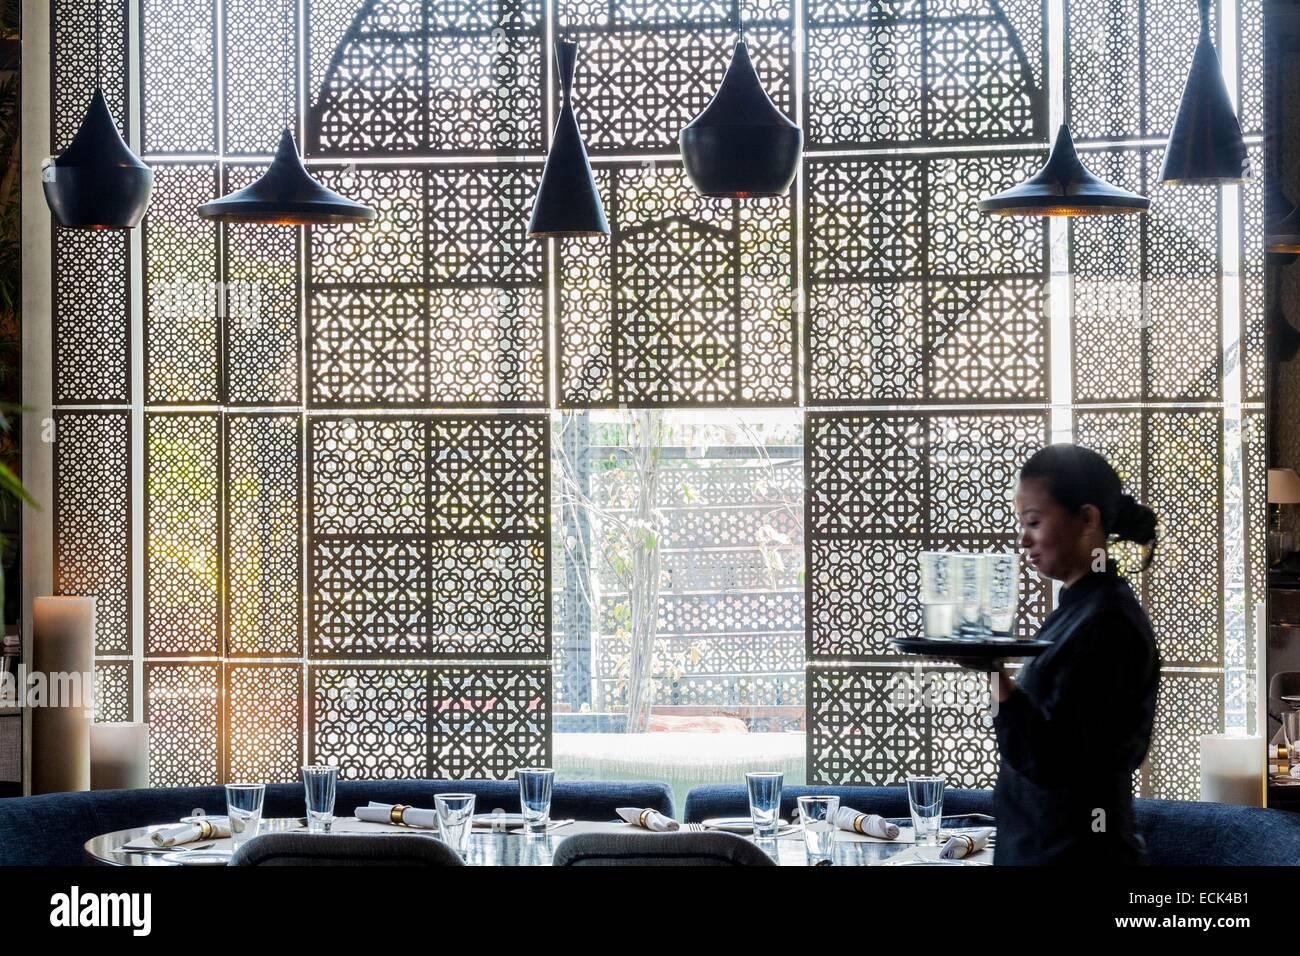 India, New Delhi, Vasant Kunj, luxury mall DLF Emporio, Kainoosh restaurant designed by the architectural firm Studio - Stock Image